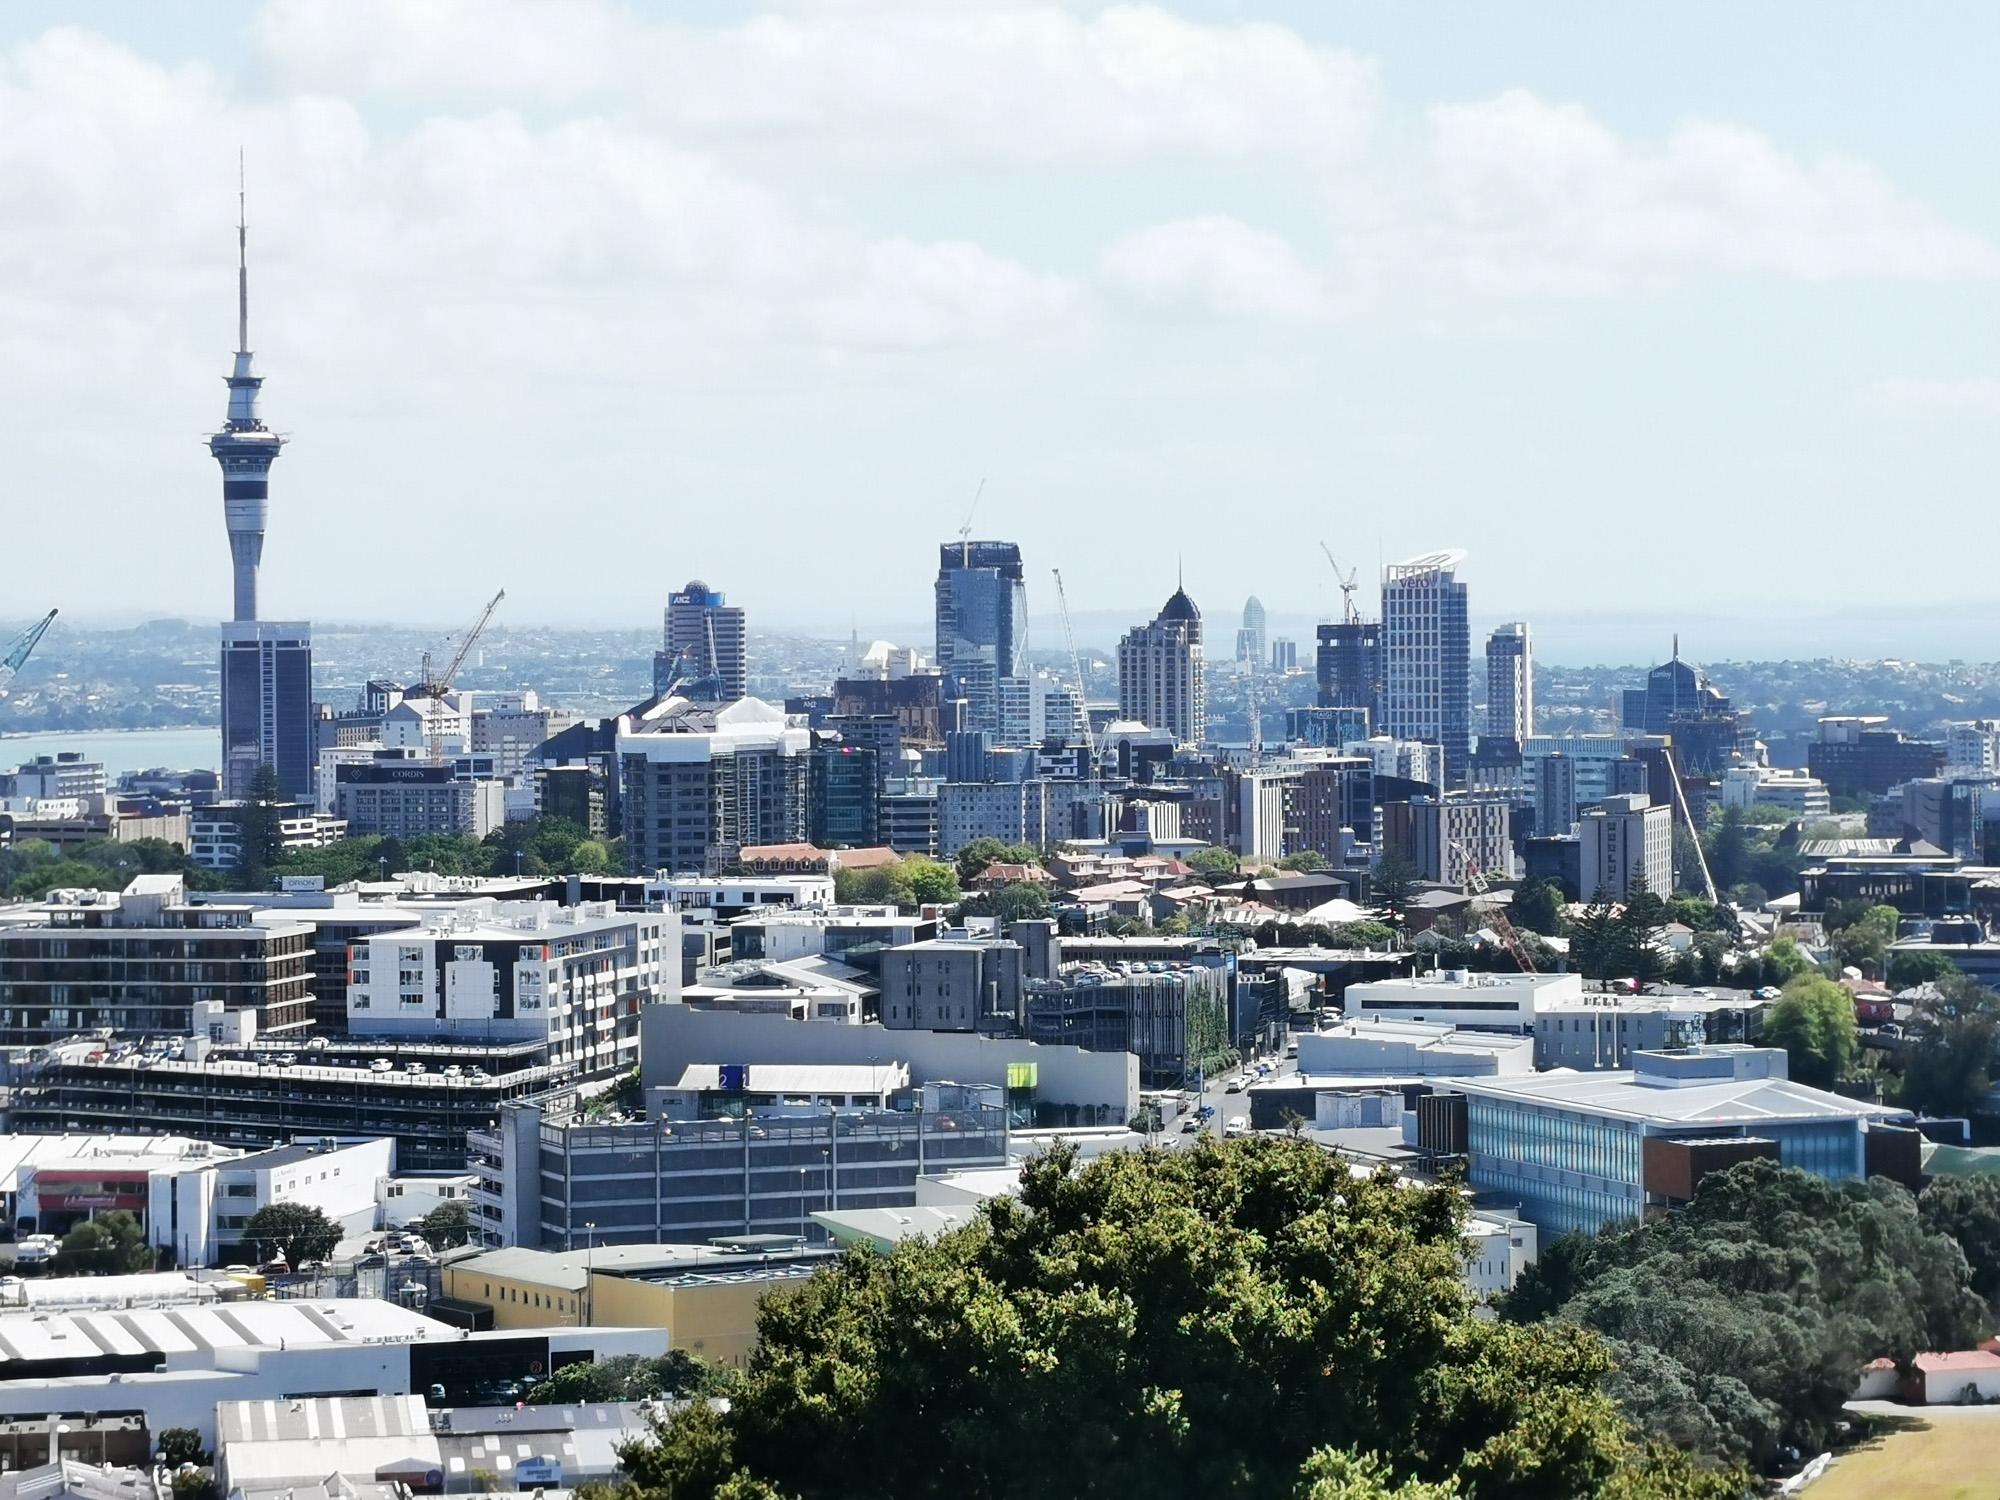 Nau mai, haere mai…welcome to New Zealand